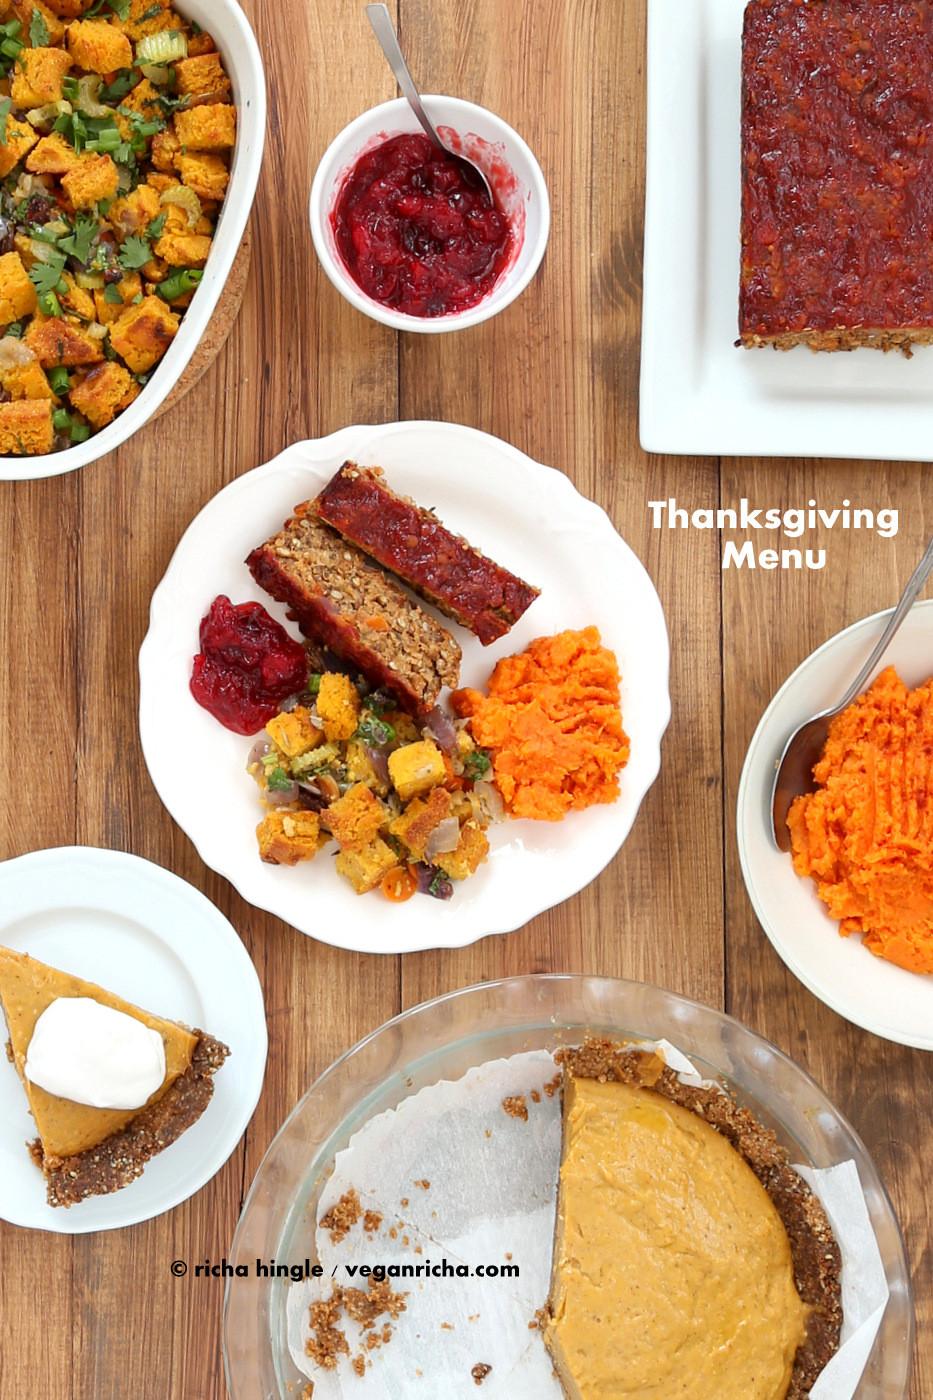 Vegan Recipe For Thanksgiving  80 Vegan Thanksgiving Recipes 2014 Vegan Richa